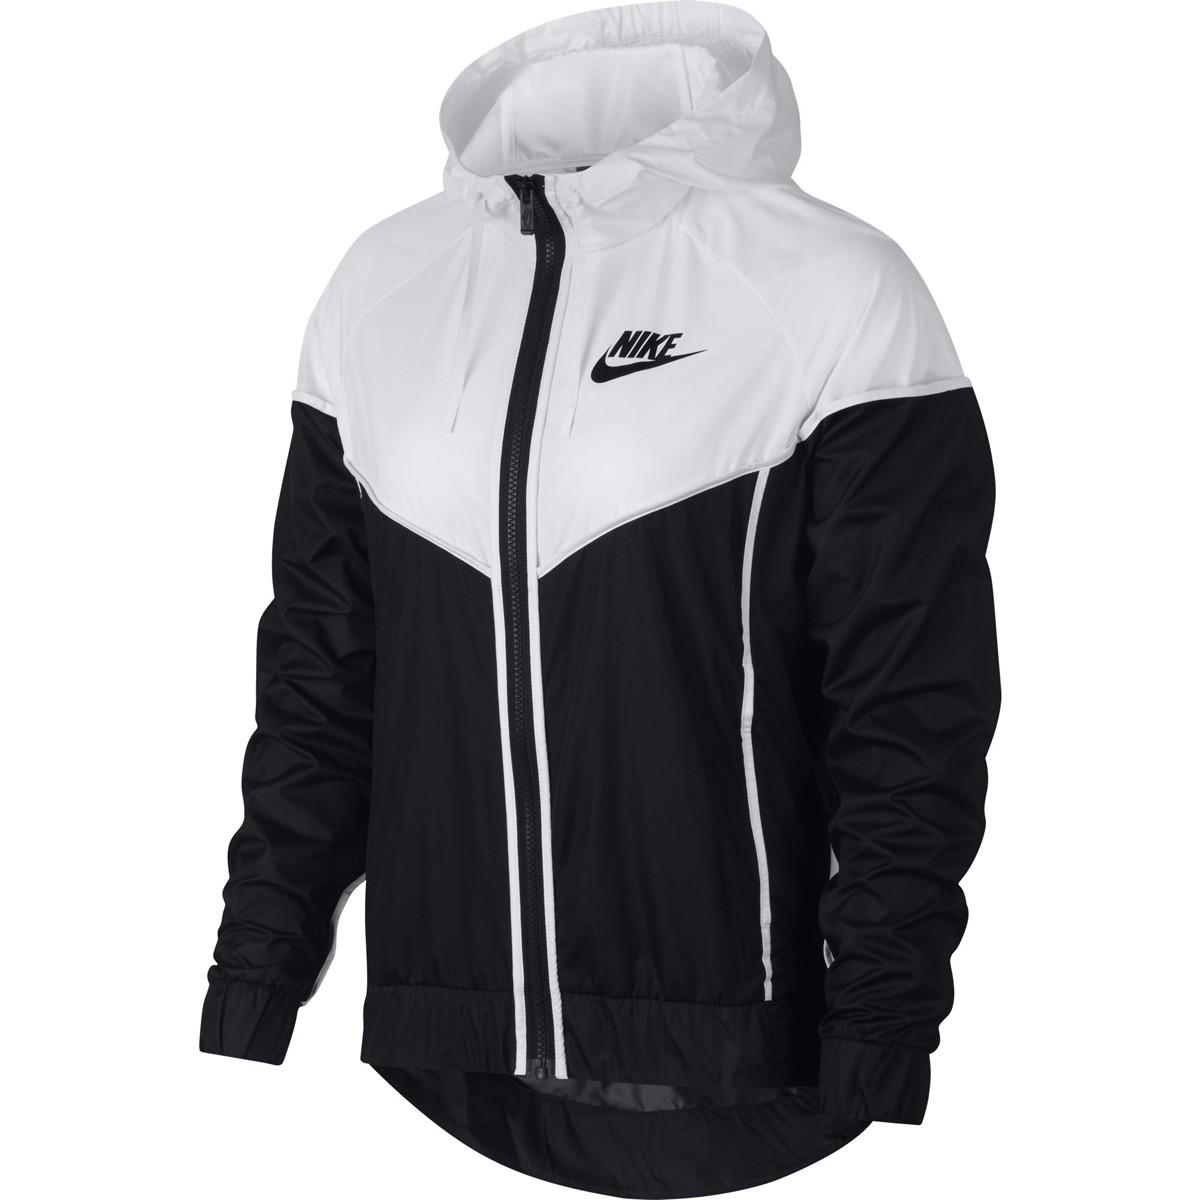 687caae9fd93 ... Women s Nike Sportswear Windrunner Full Zip Jacket  black  white black  ...